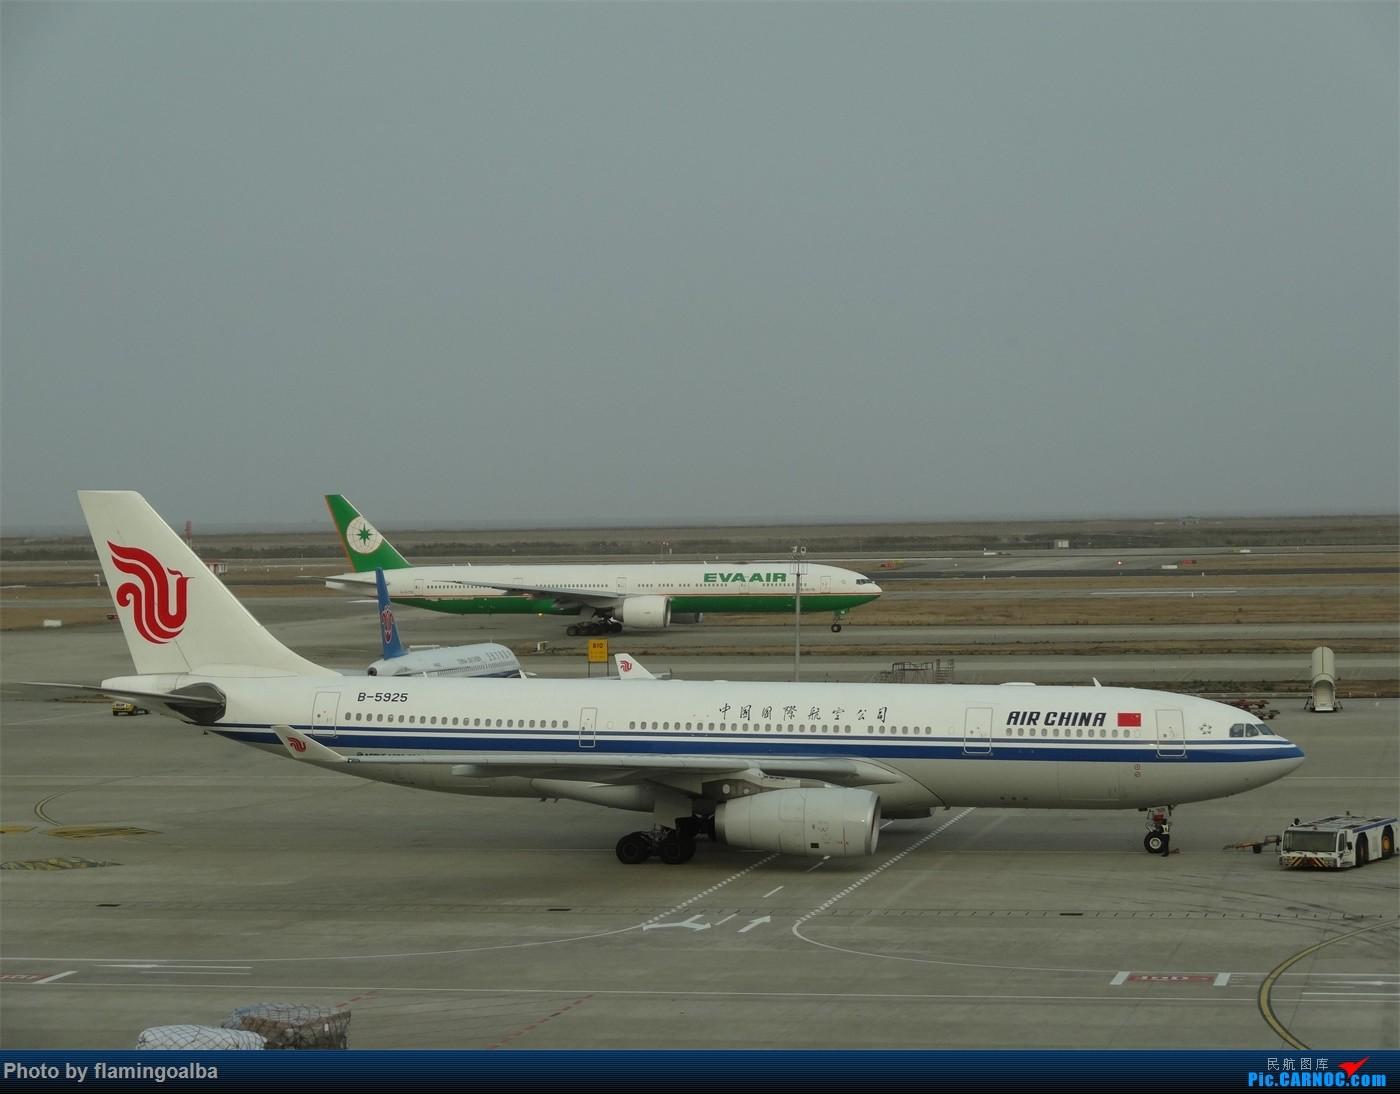 Re:[原创]浦东-达拉斯-纽瓦克-华盛顿里根-拉斯维加斯-洛杉矶-达拉斯-浦东 AIRBUS A330-200 B-5925 中国上海浦东国际机场